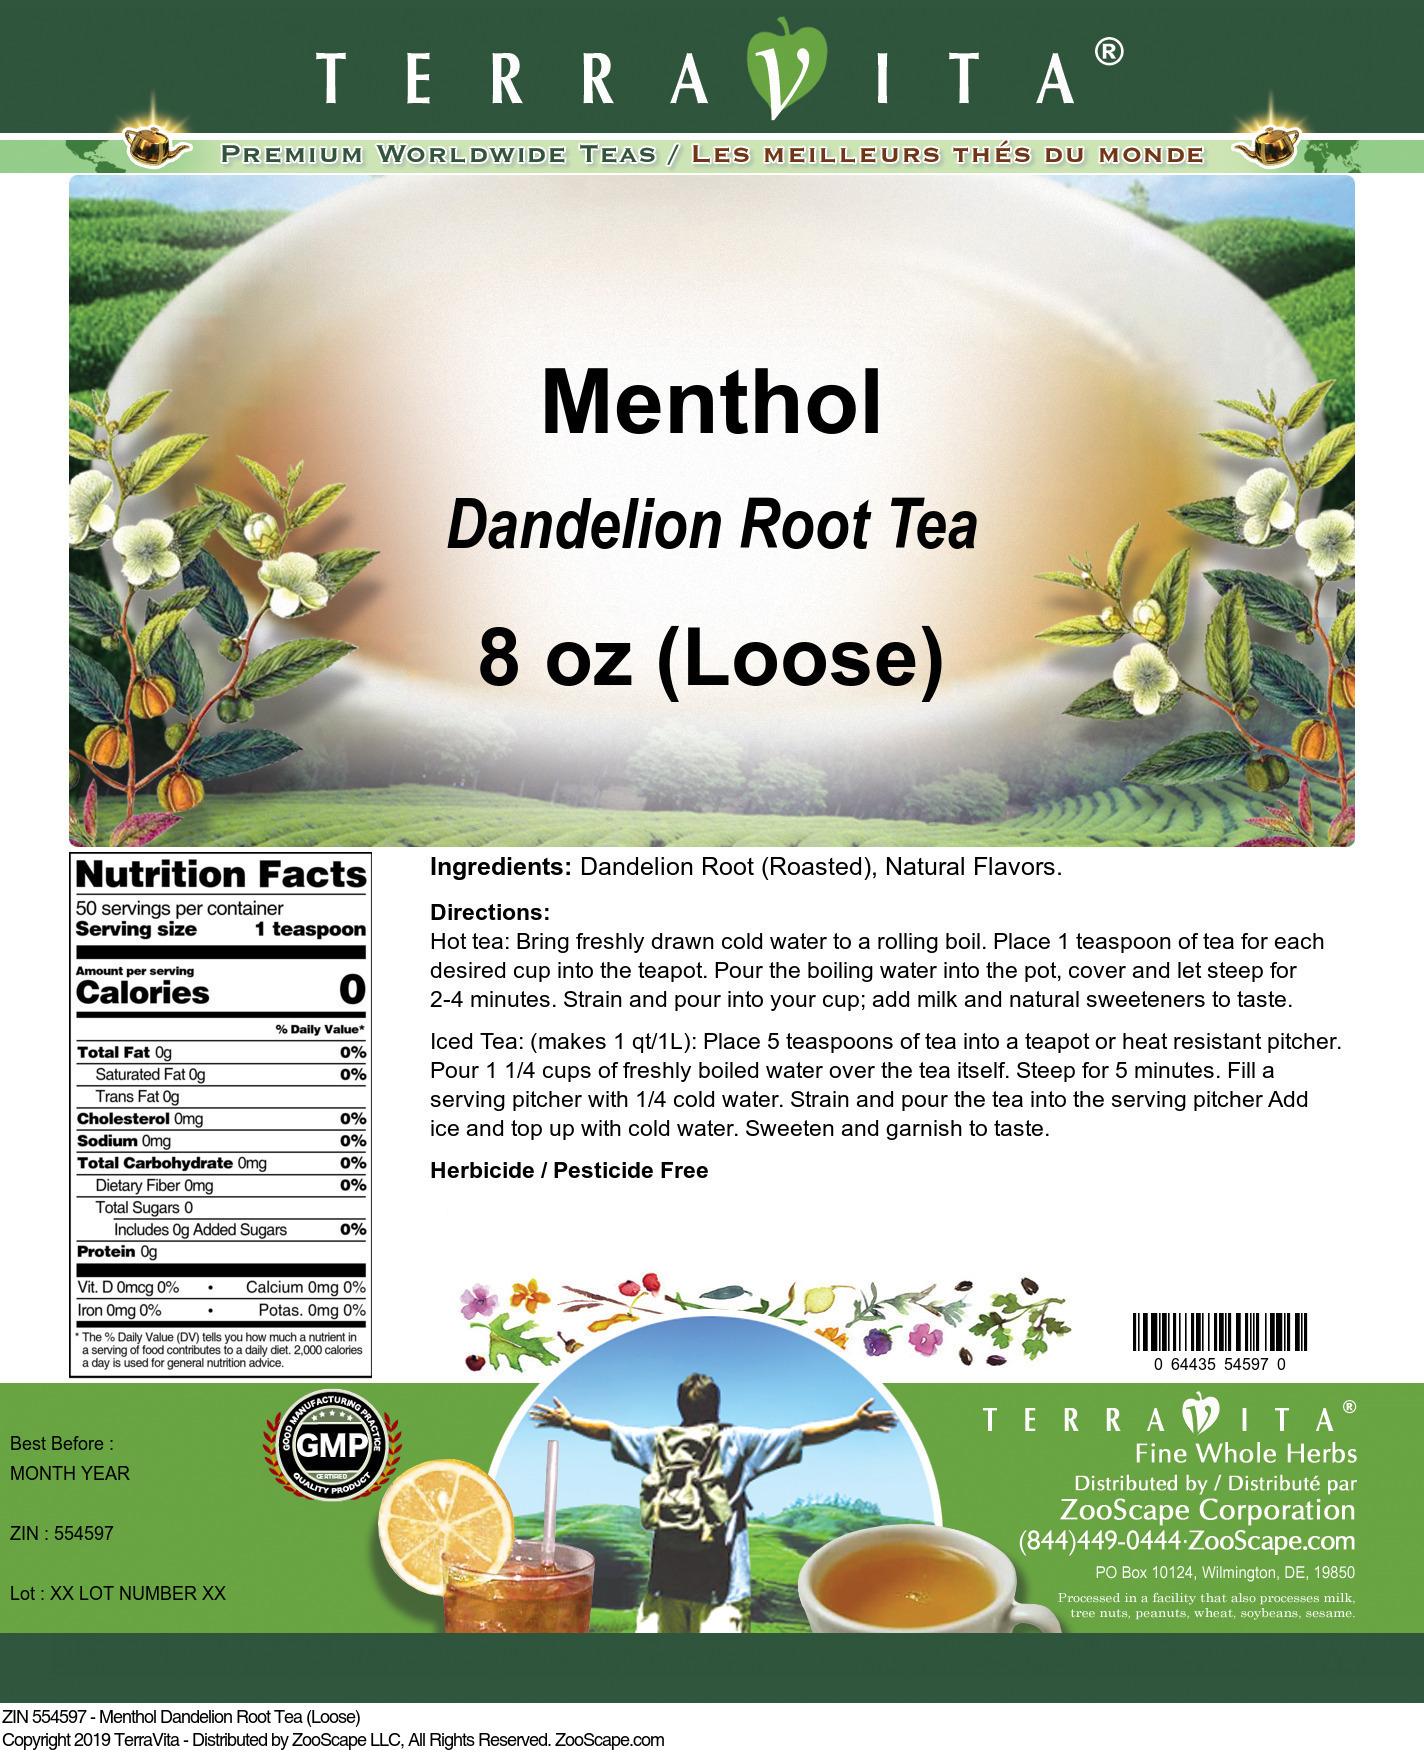 Menthol Dandelion Root